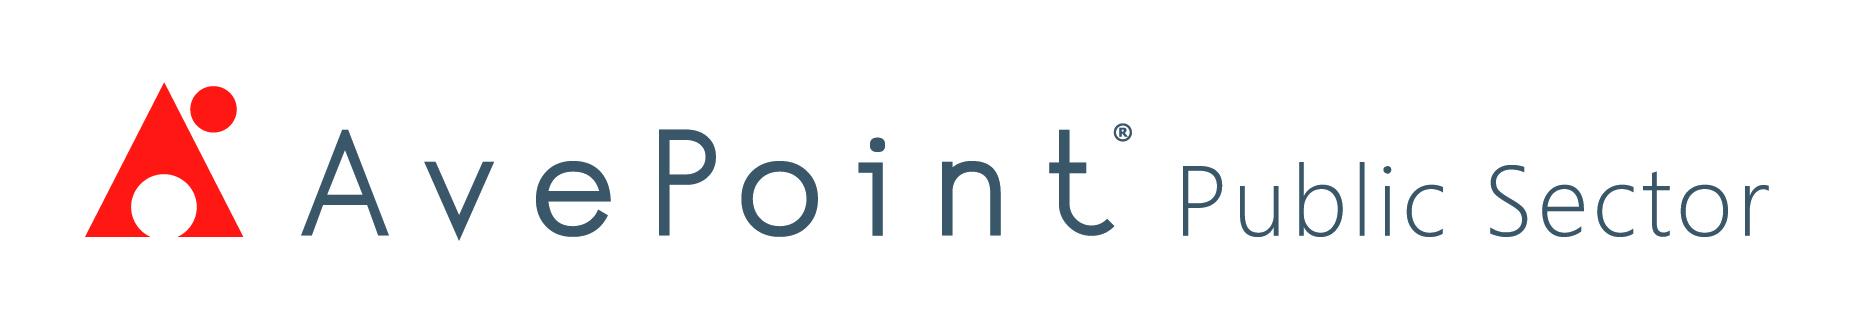 AvePoint Public Sector logo